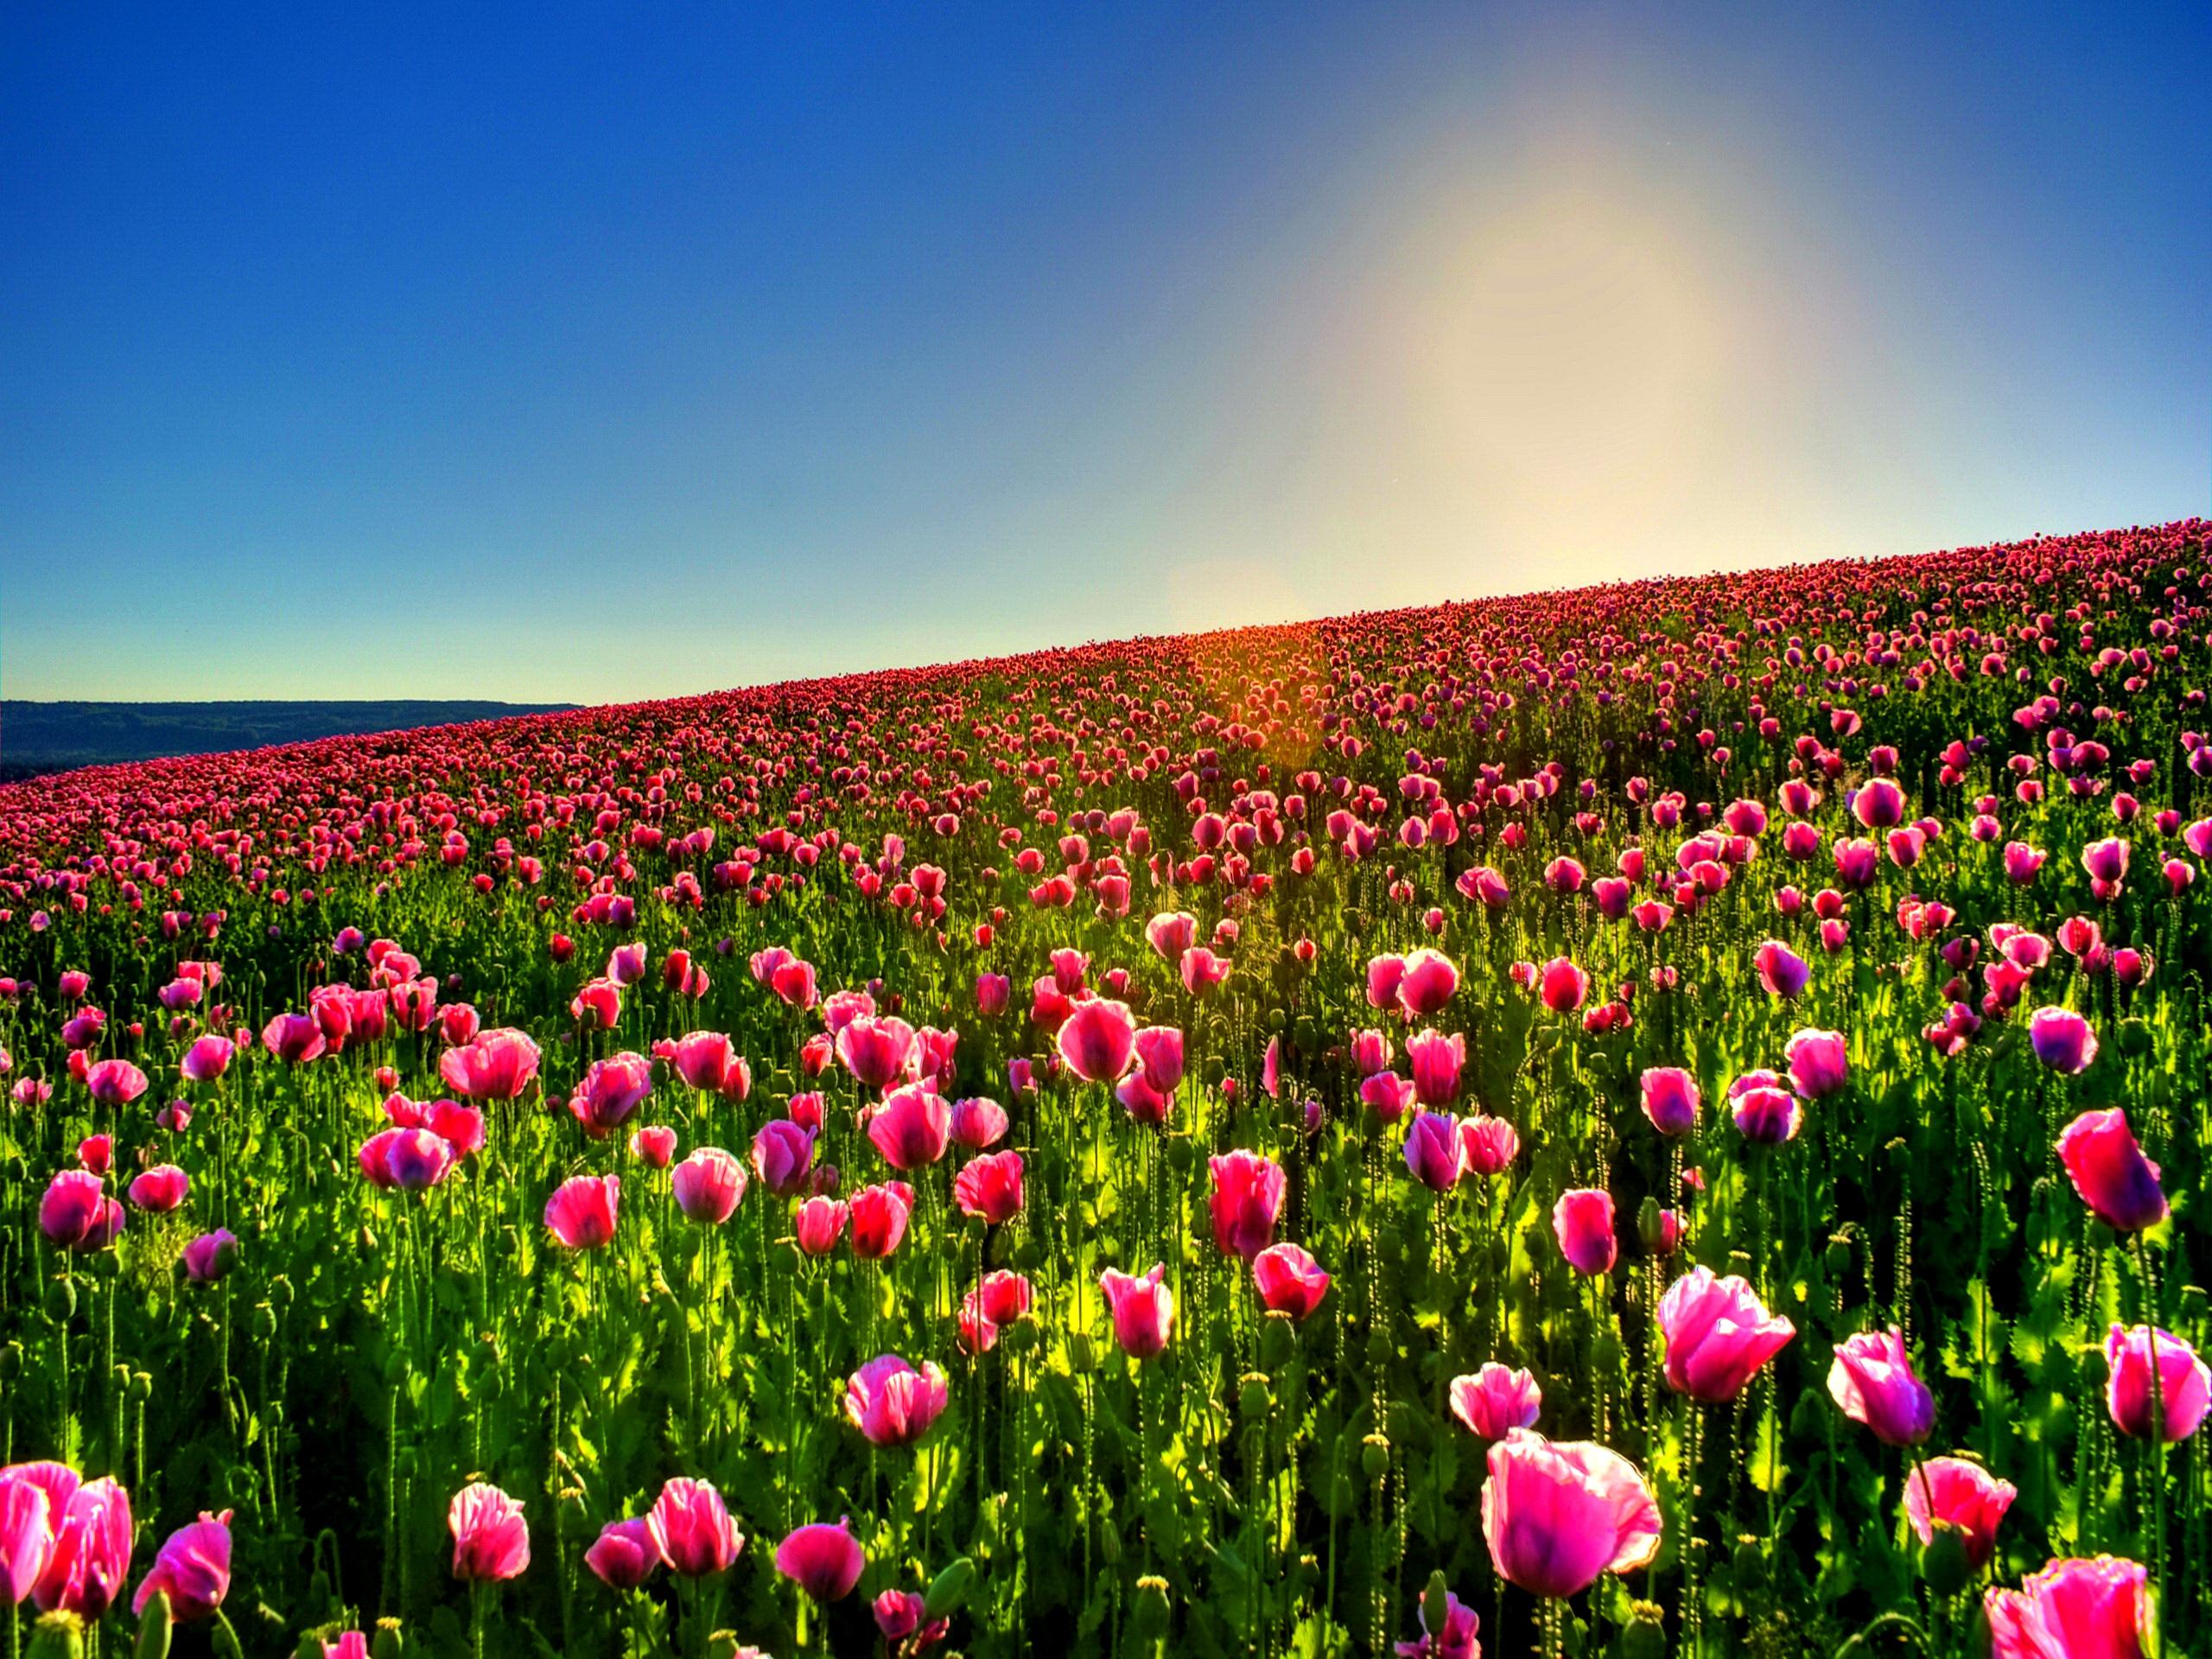 Yellow Tulip Field wallpaper | 2560x1920 | #23771